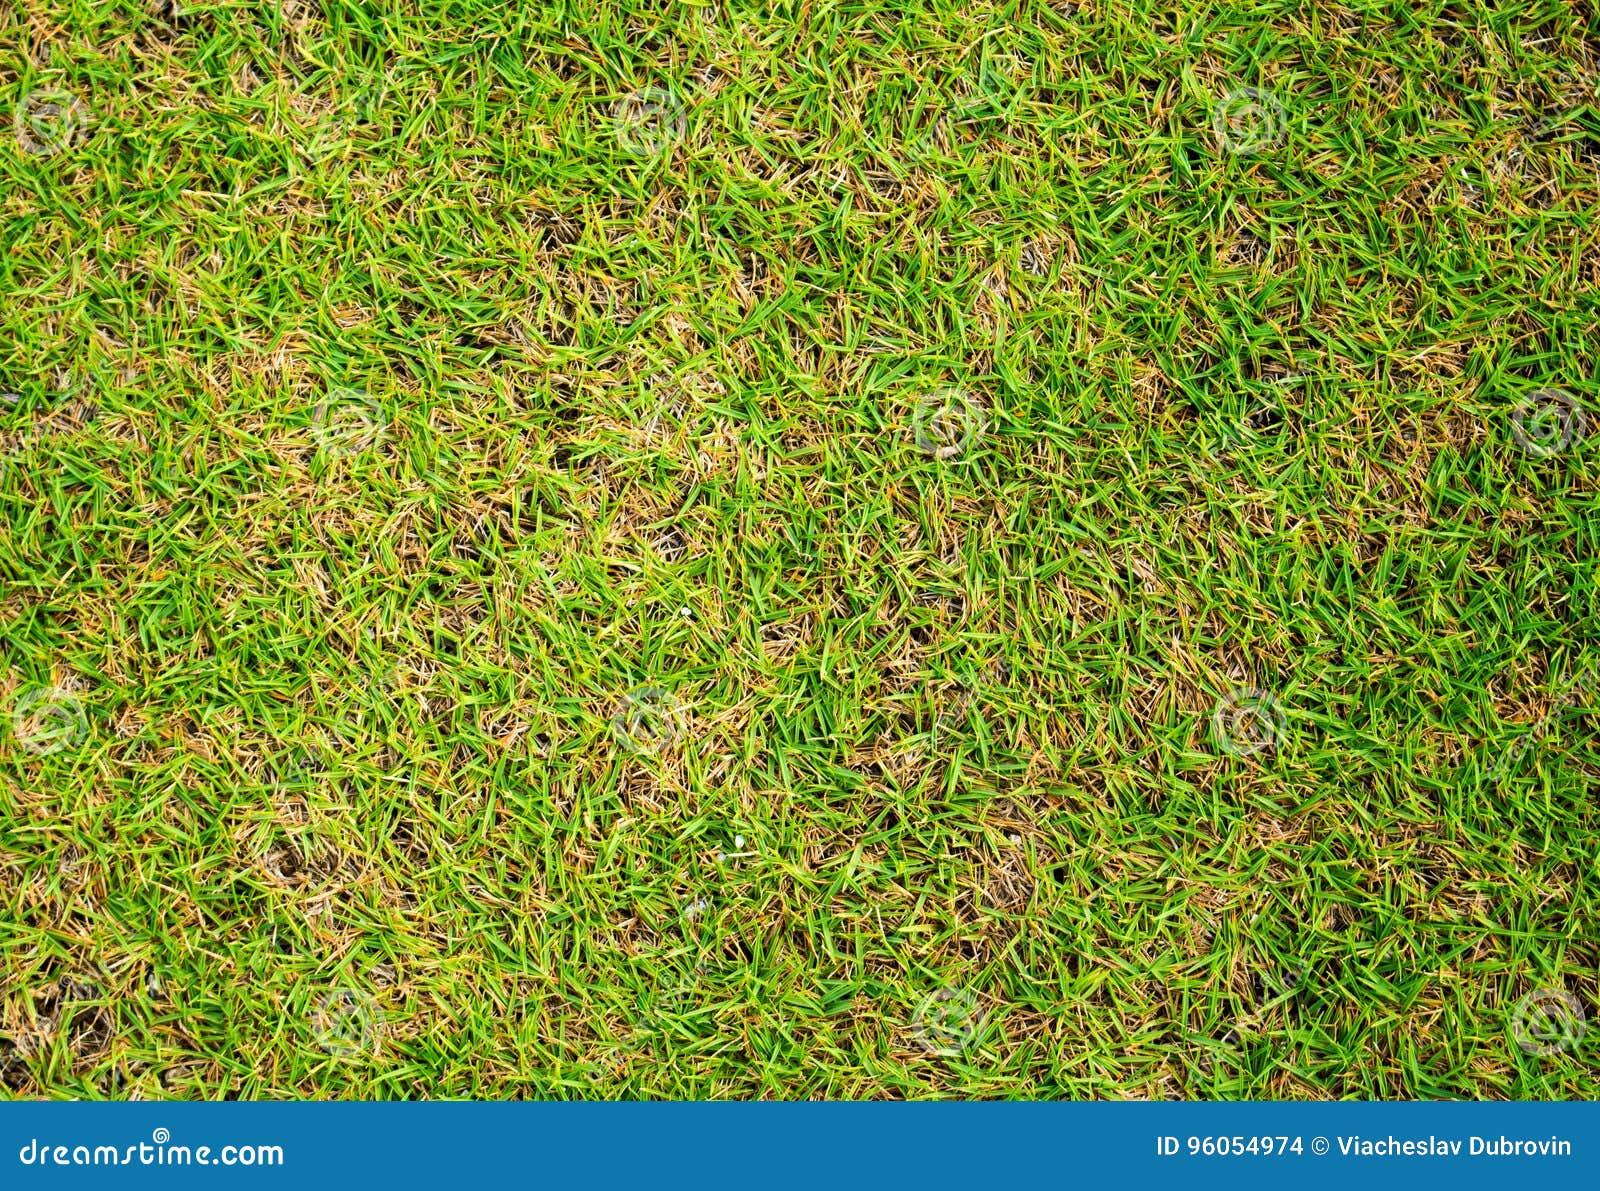 Fond court d herbe, fond de terrain de football d herbe verte, image en gros plan d herbe verte de ressort frais